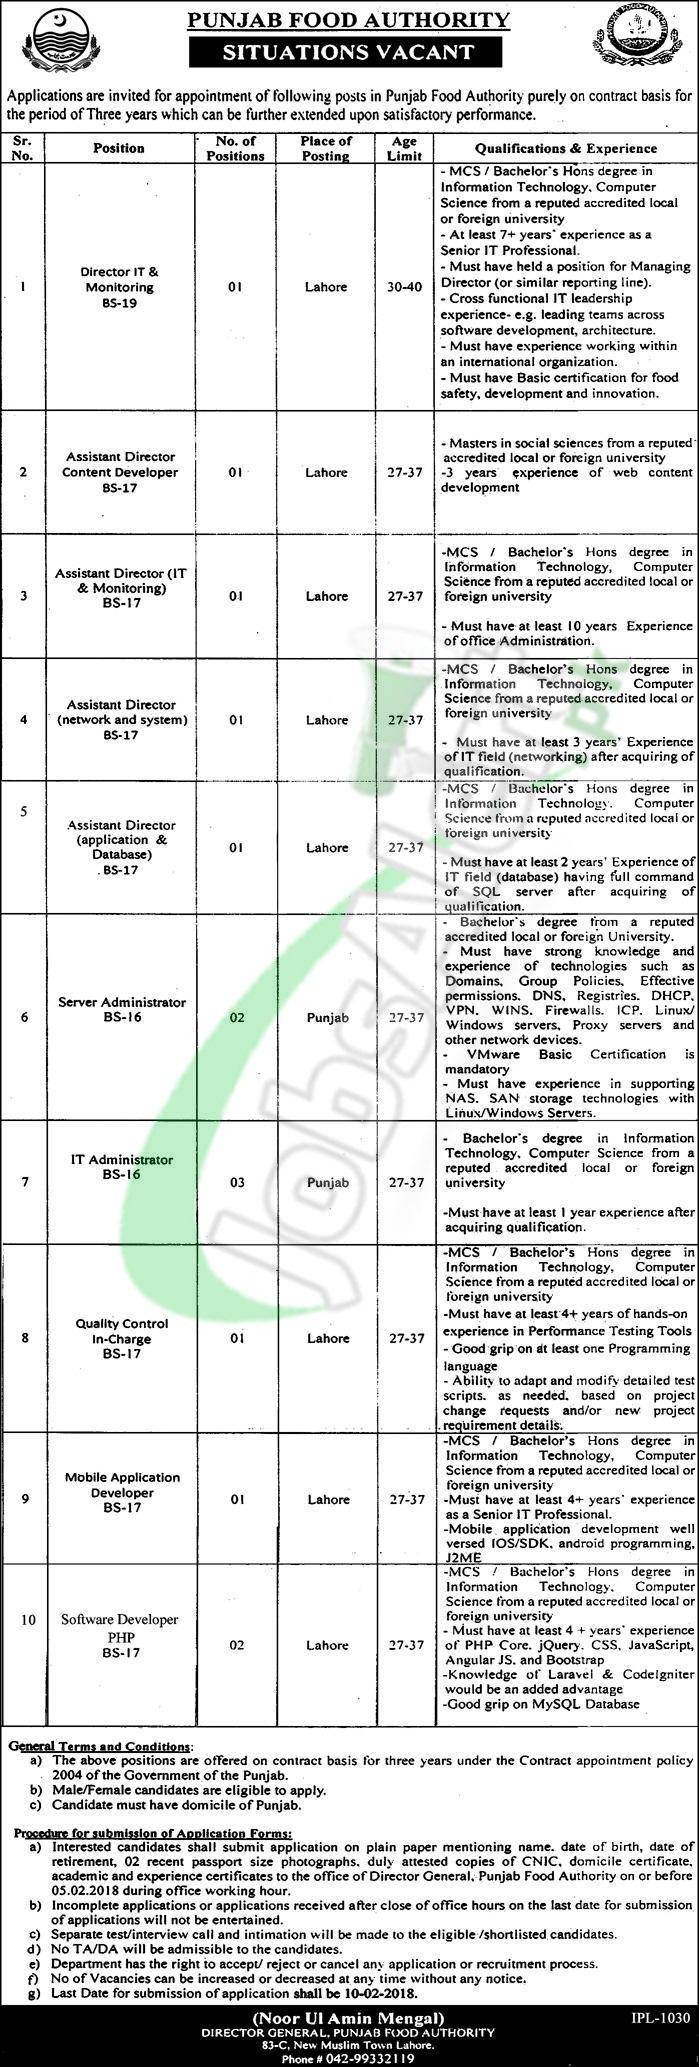 Punjab Food Authority Jobs